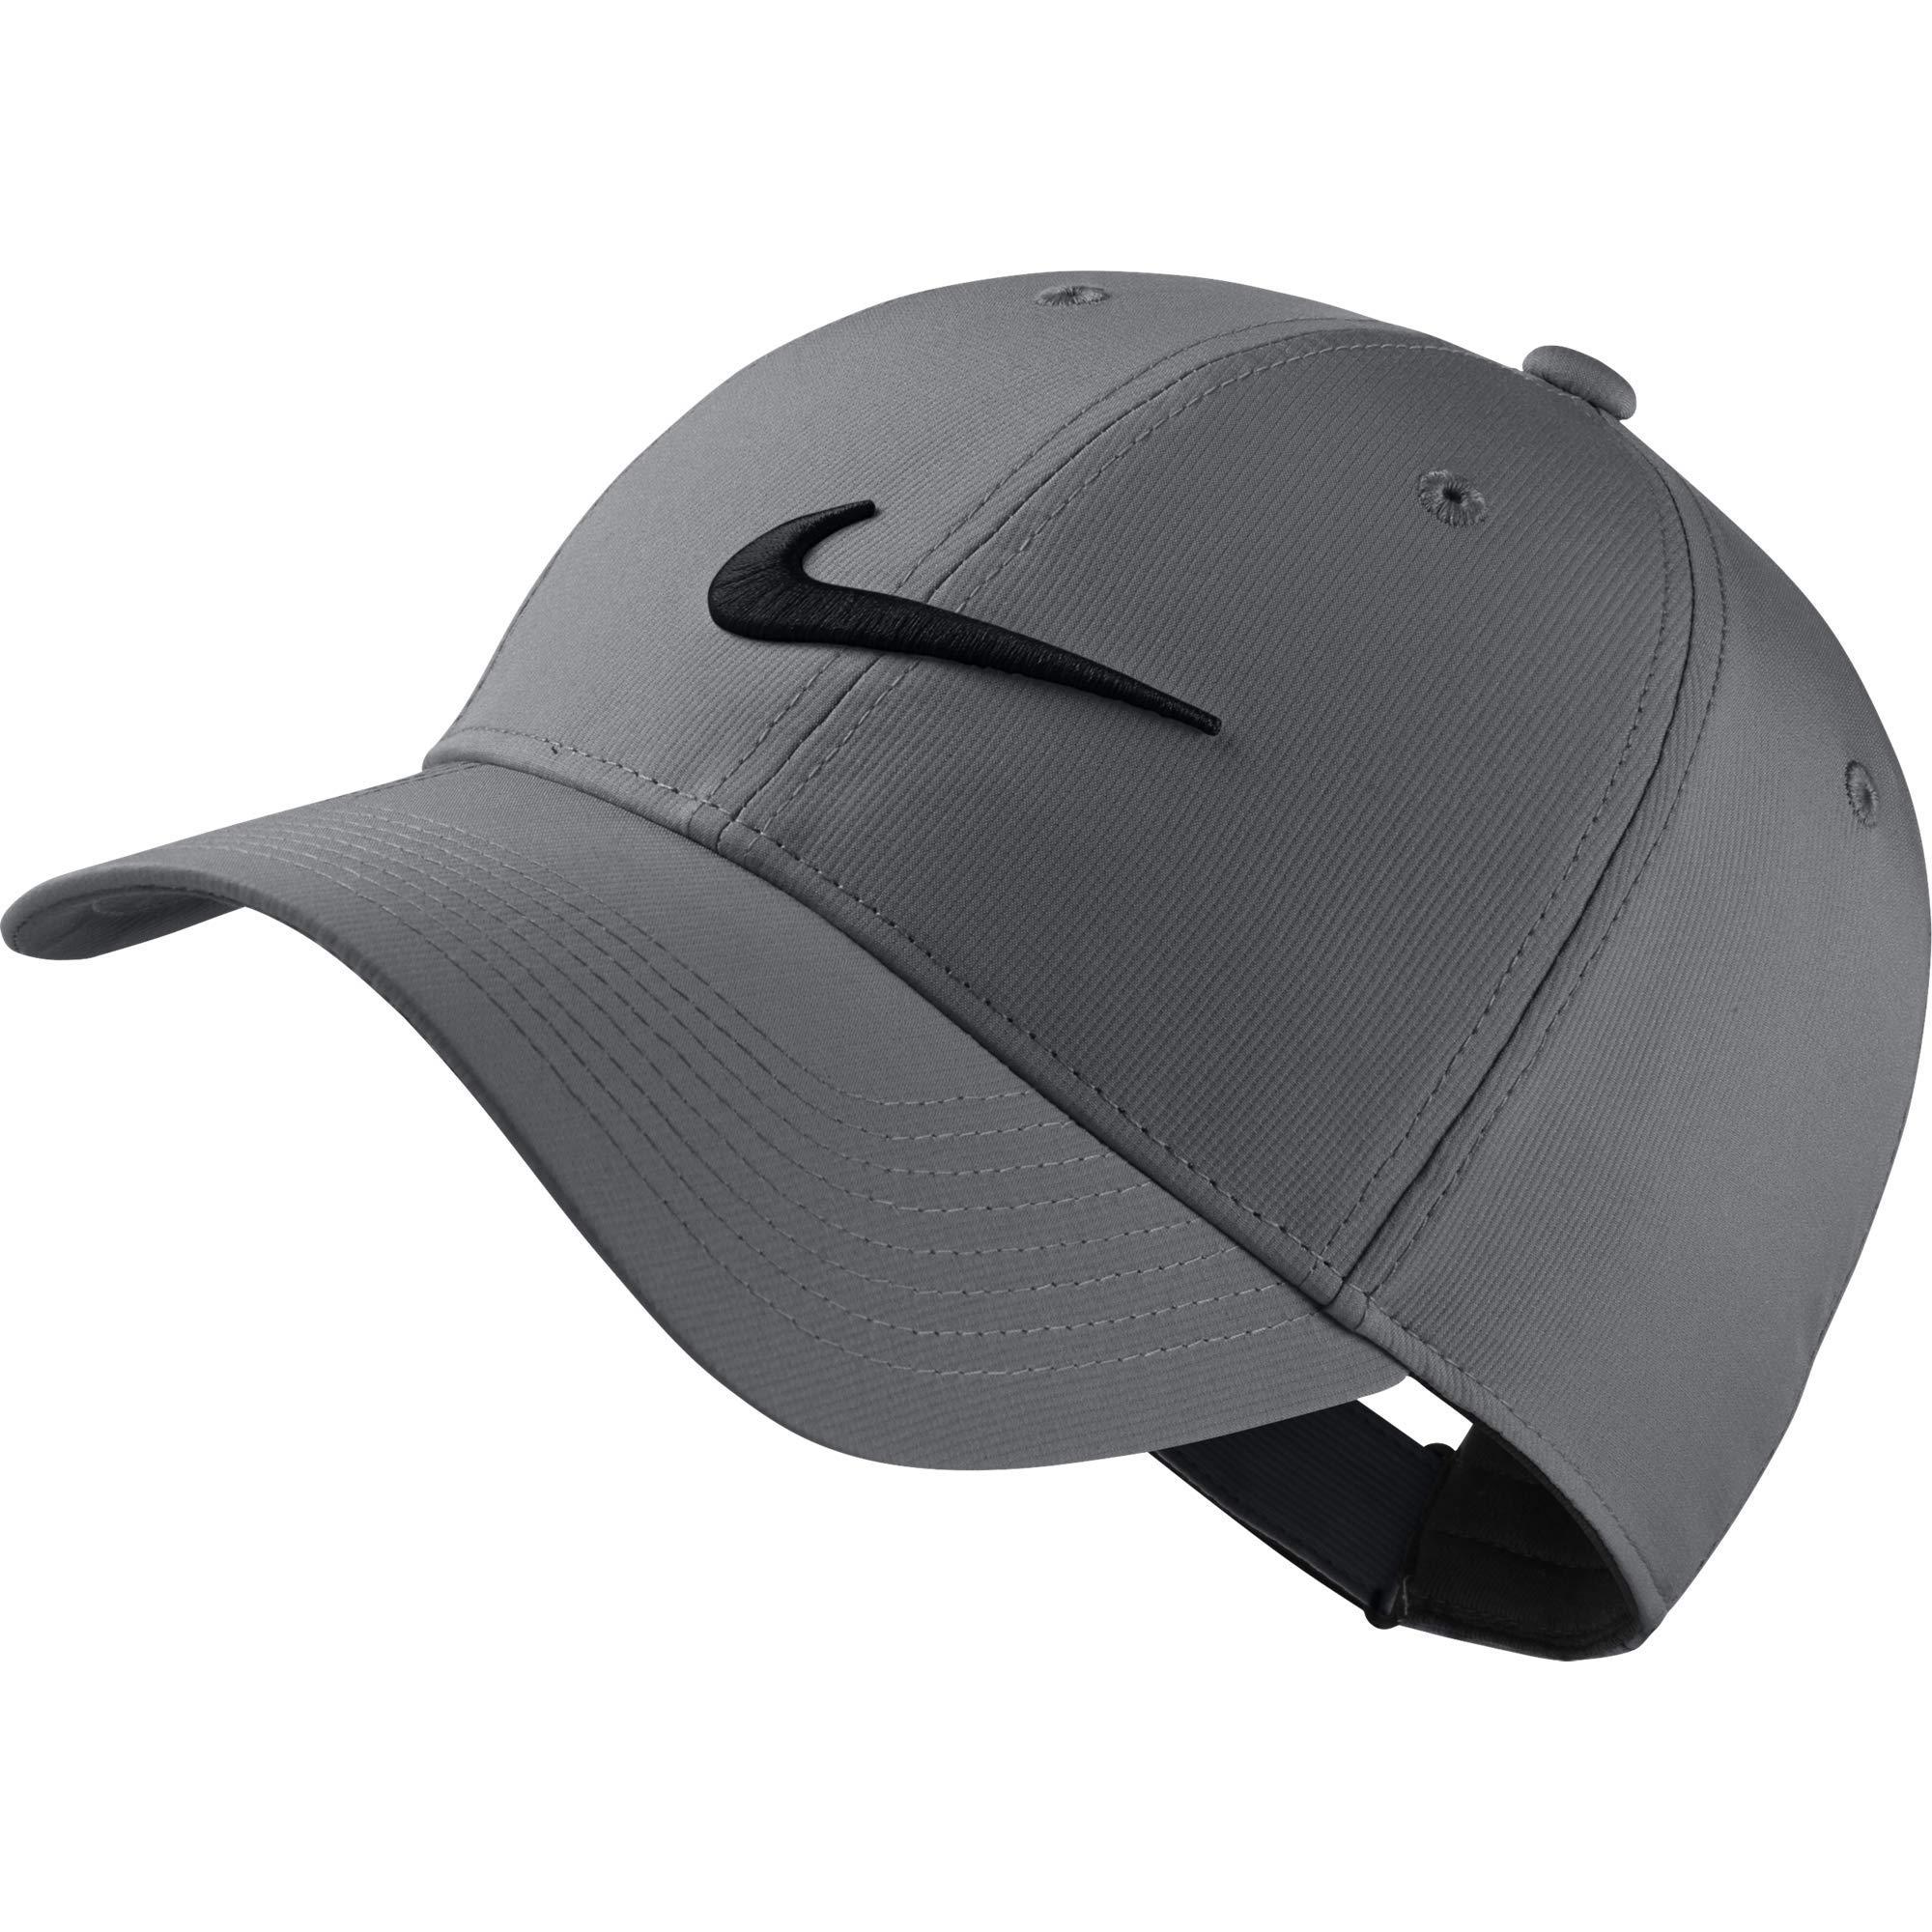 Nike L91 Tech Cap, Dark Grey/Anthracite/Black, Misc